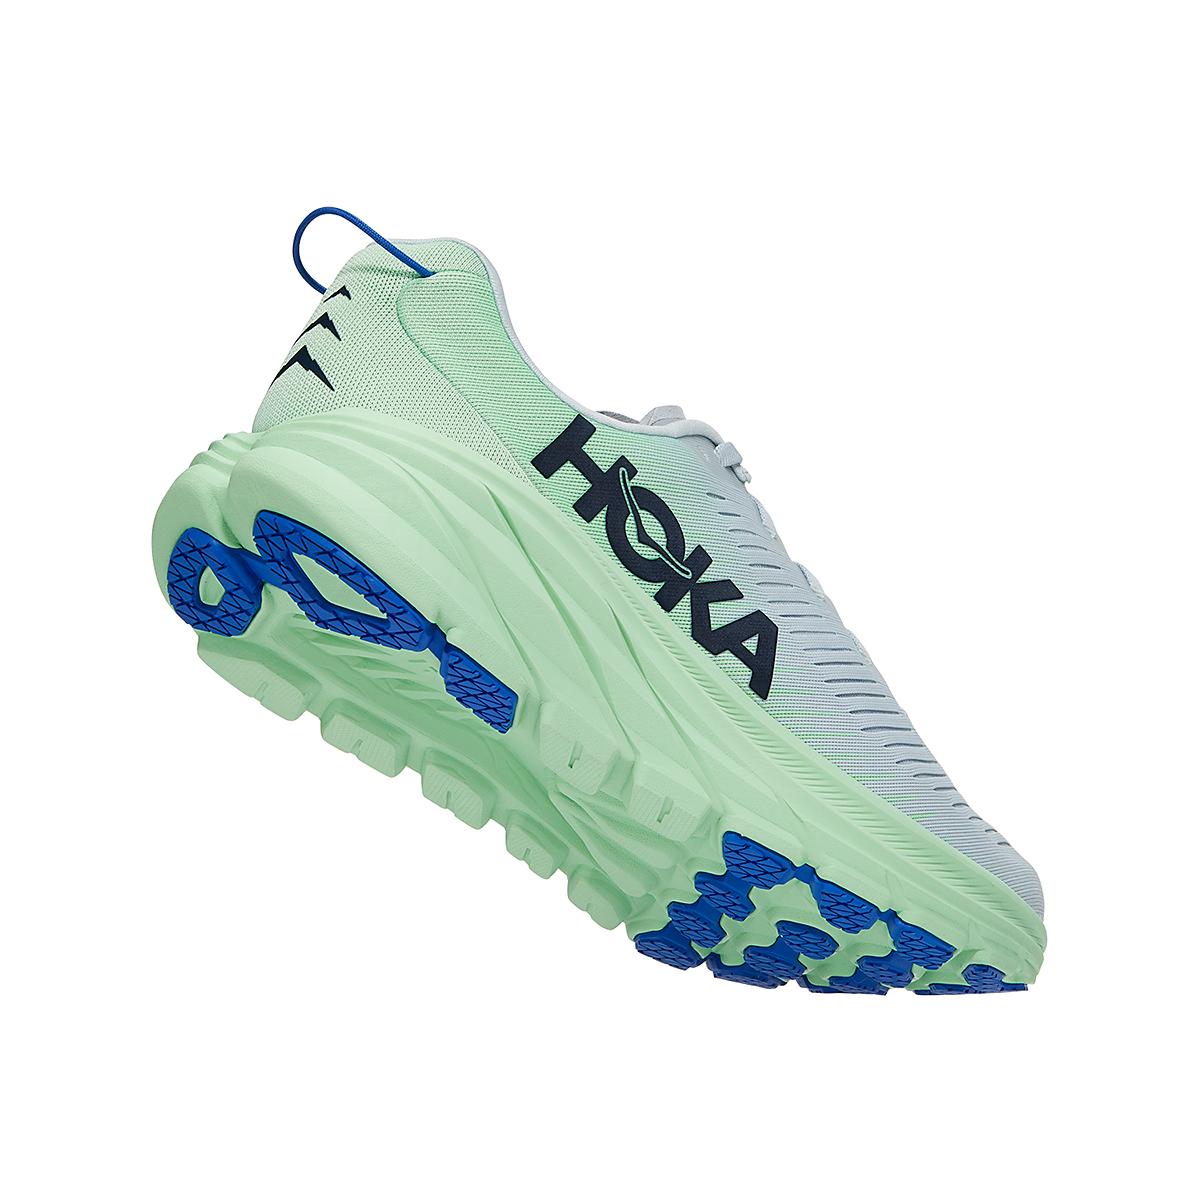 Men's Hoka One One Rincon 3 Running Shoe - Color: Plein Air/Green Ash - Size: 7 - Width: Regular, Plein Air/Green Ash, large, image 3